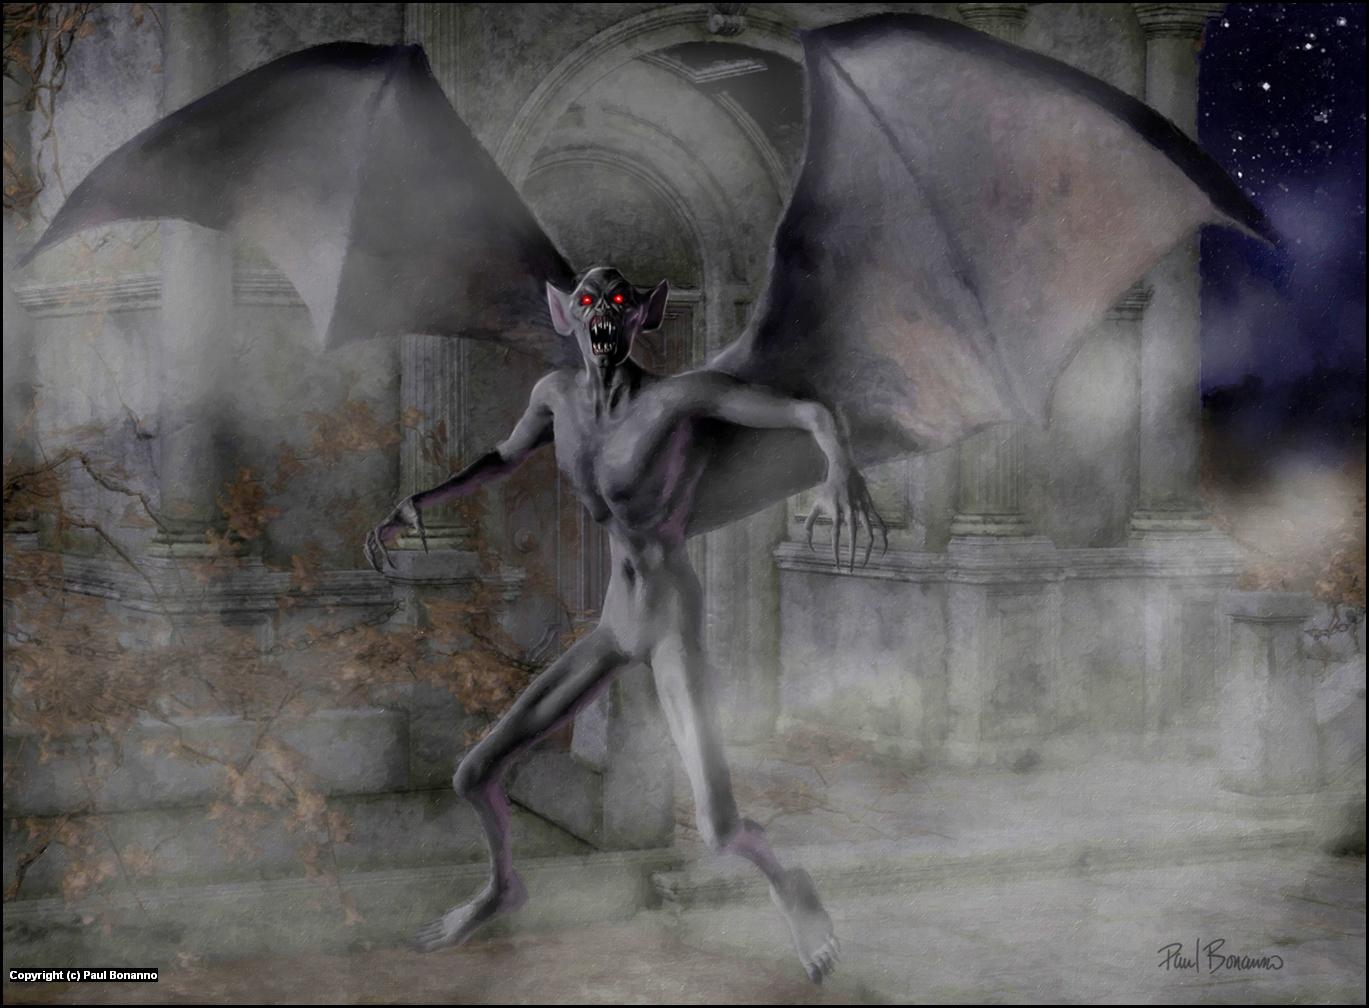 Night terror Artwork by Paul Bonanno